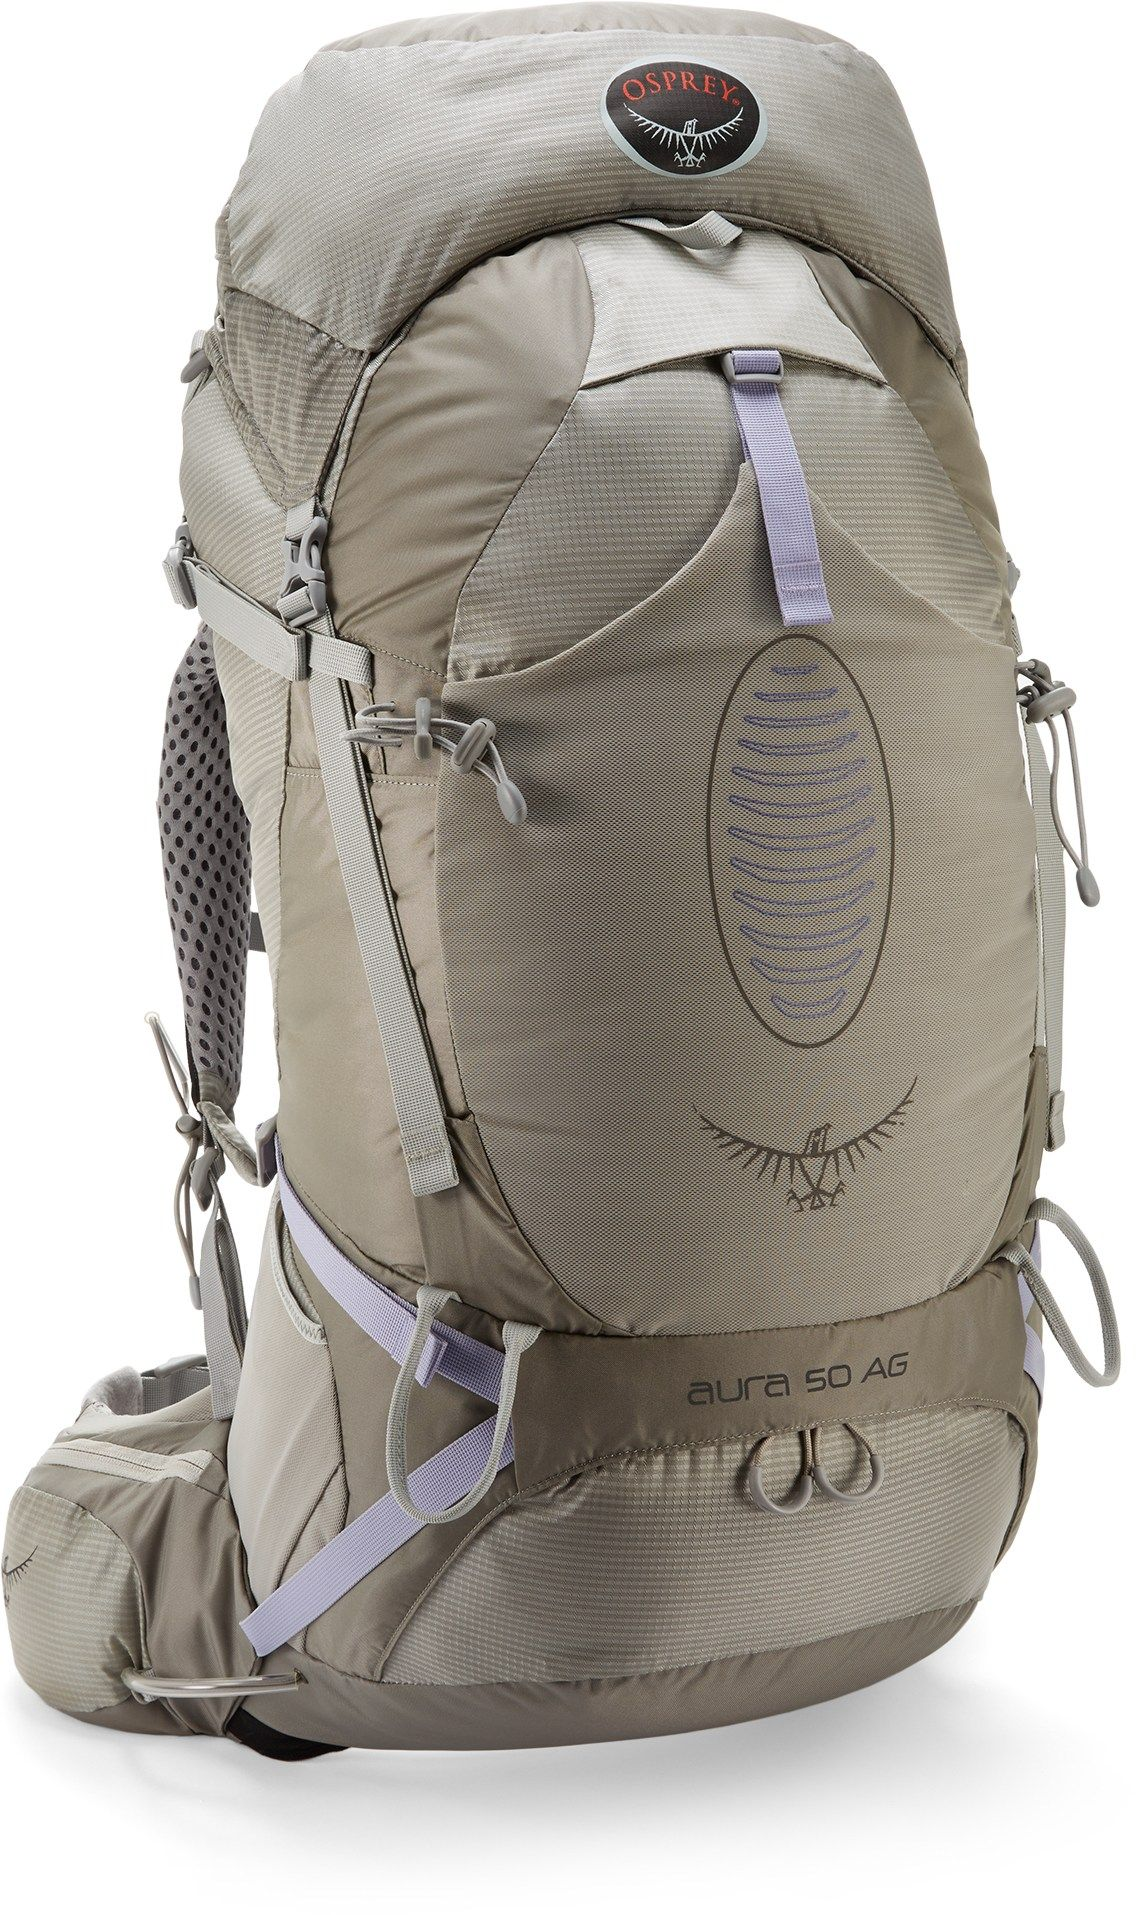 Osprey womens leather gloves - Osprey Women S Aura 50 Ag Ex Pack Silver Streak S